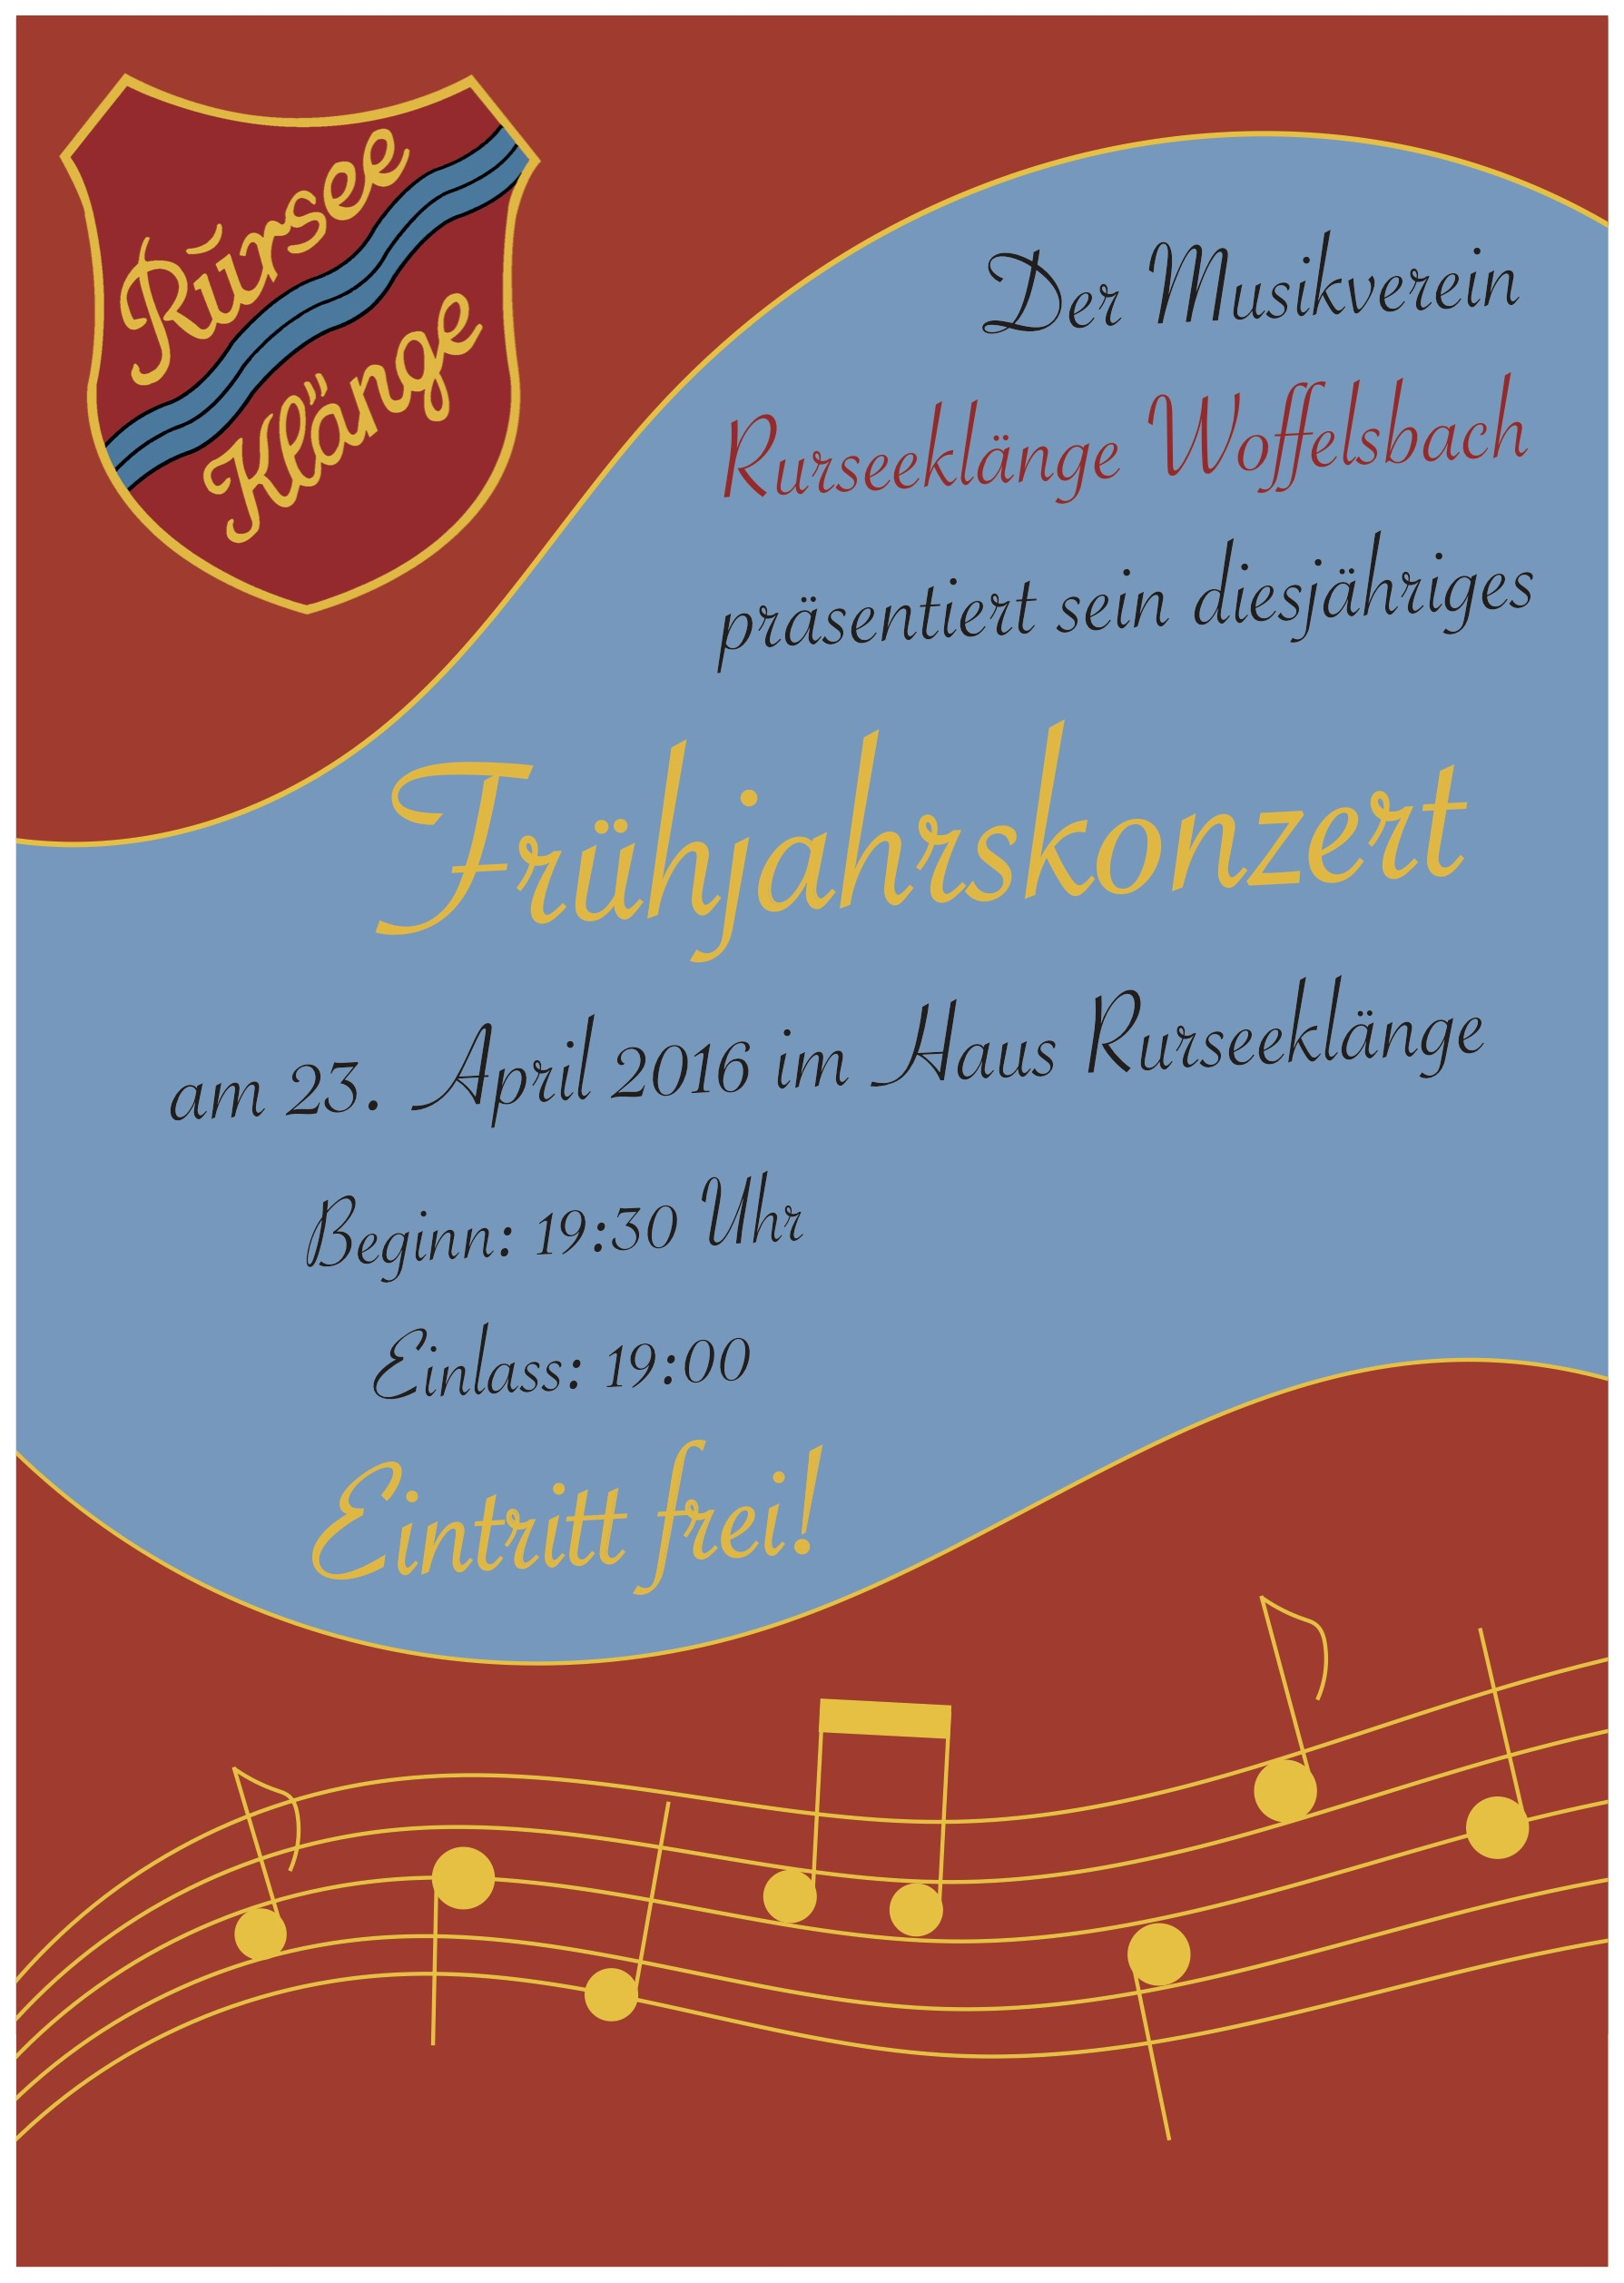 2016_04_11 Plakat_Frühjahrskonzert_Rurseeklänge